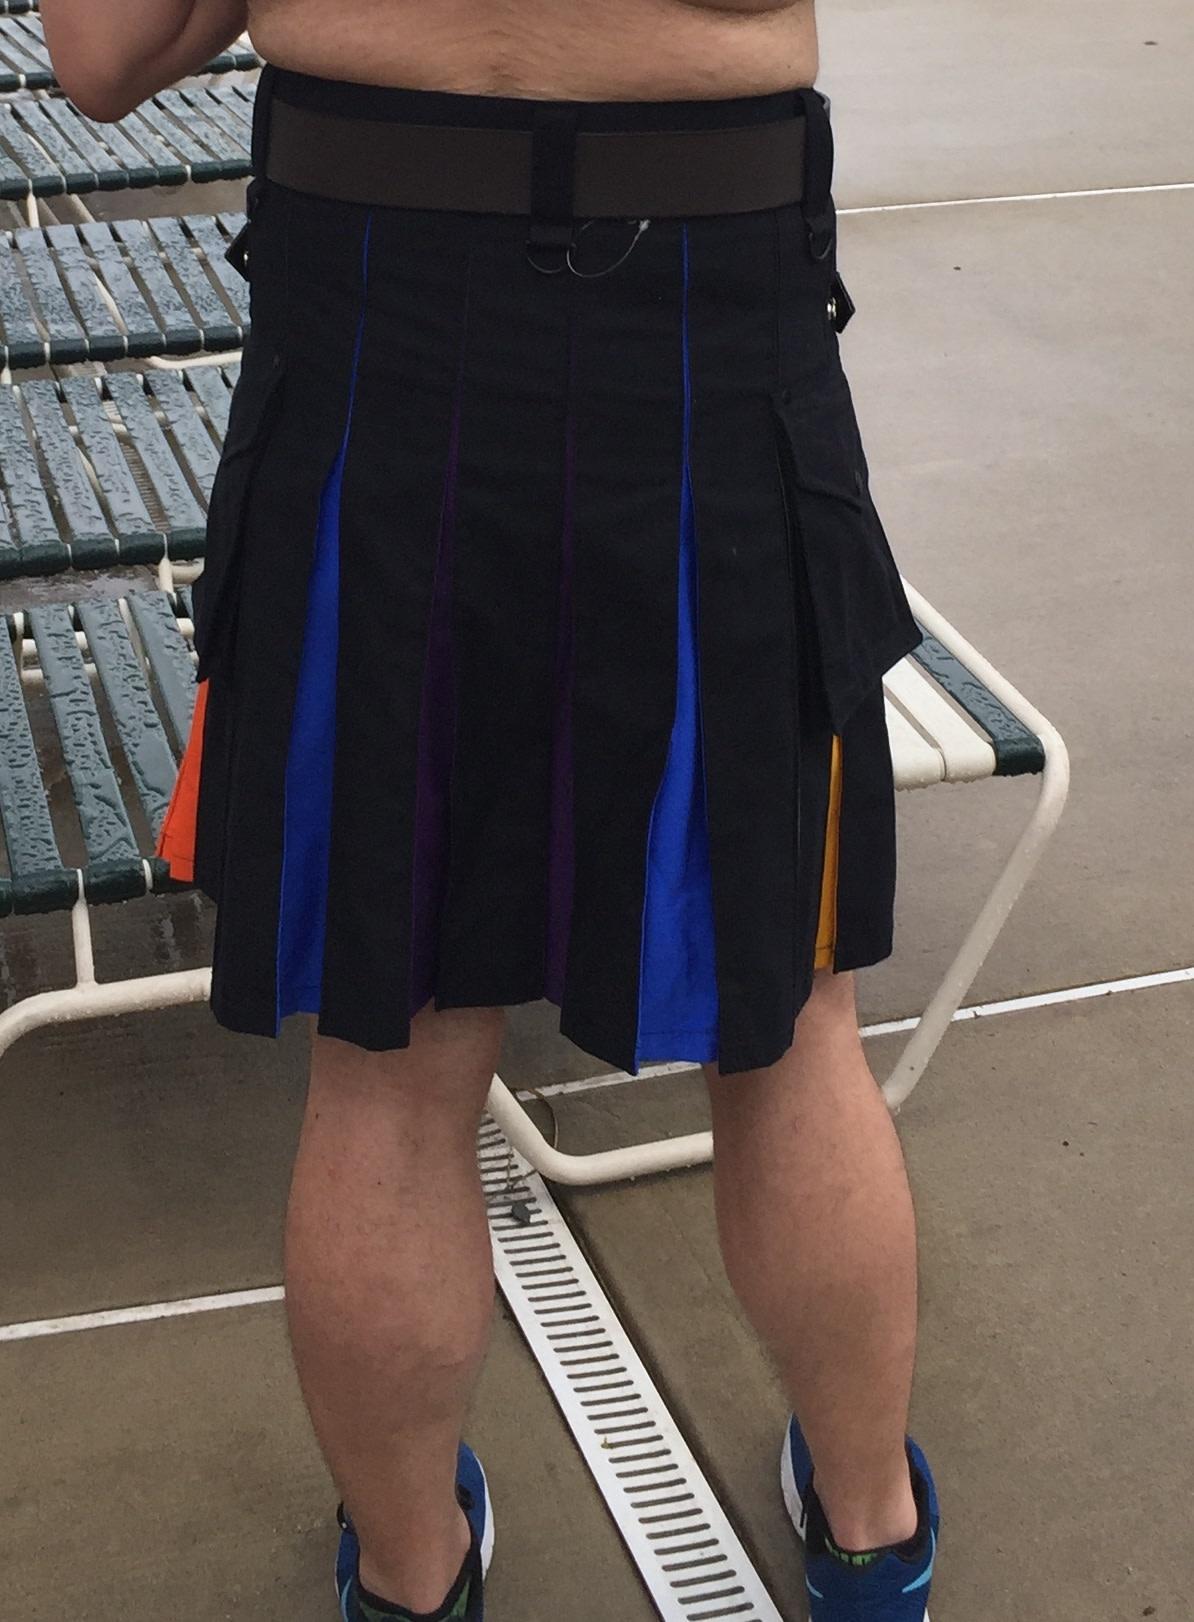 PASSIONAL Pride Flag Contrast Pleat Cargo Kilt